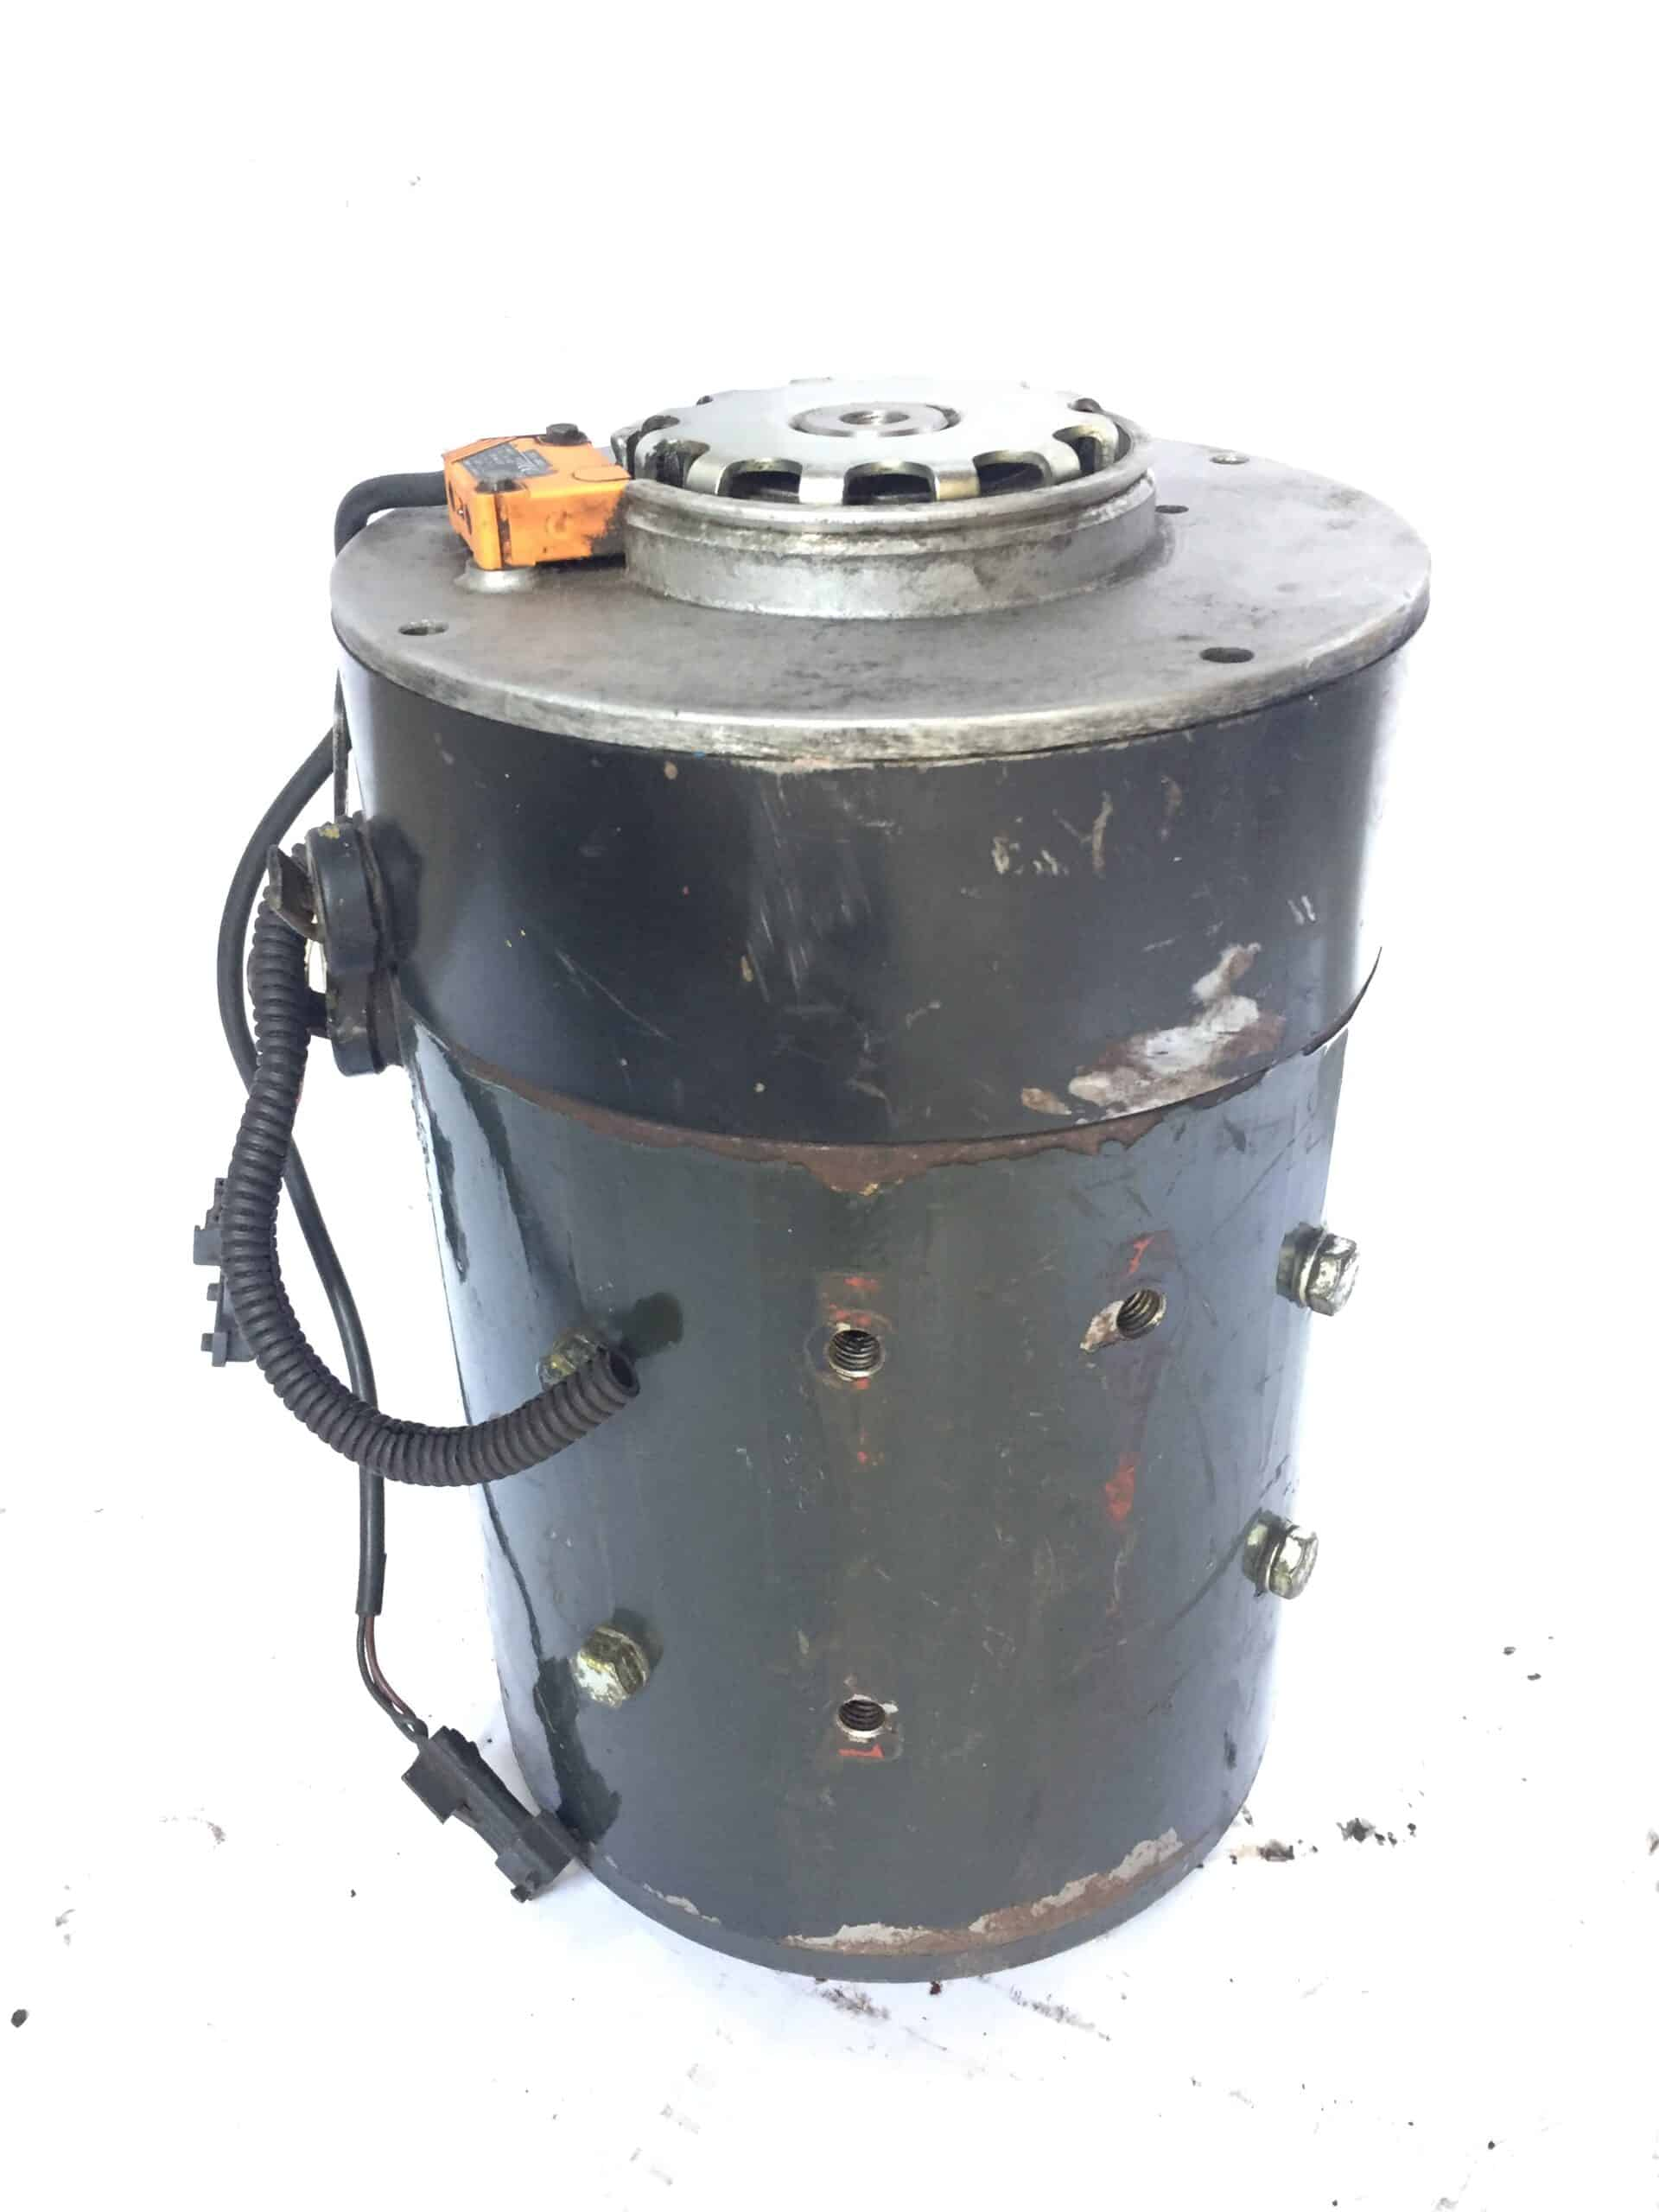 | Hydraulic pump ex. | Fazl-e-Rasheed and Company August 2021